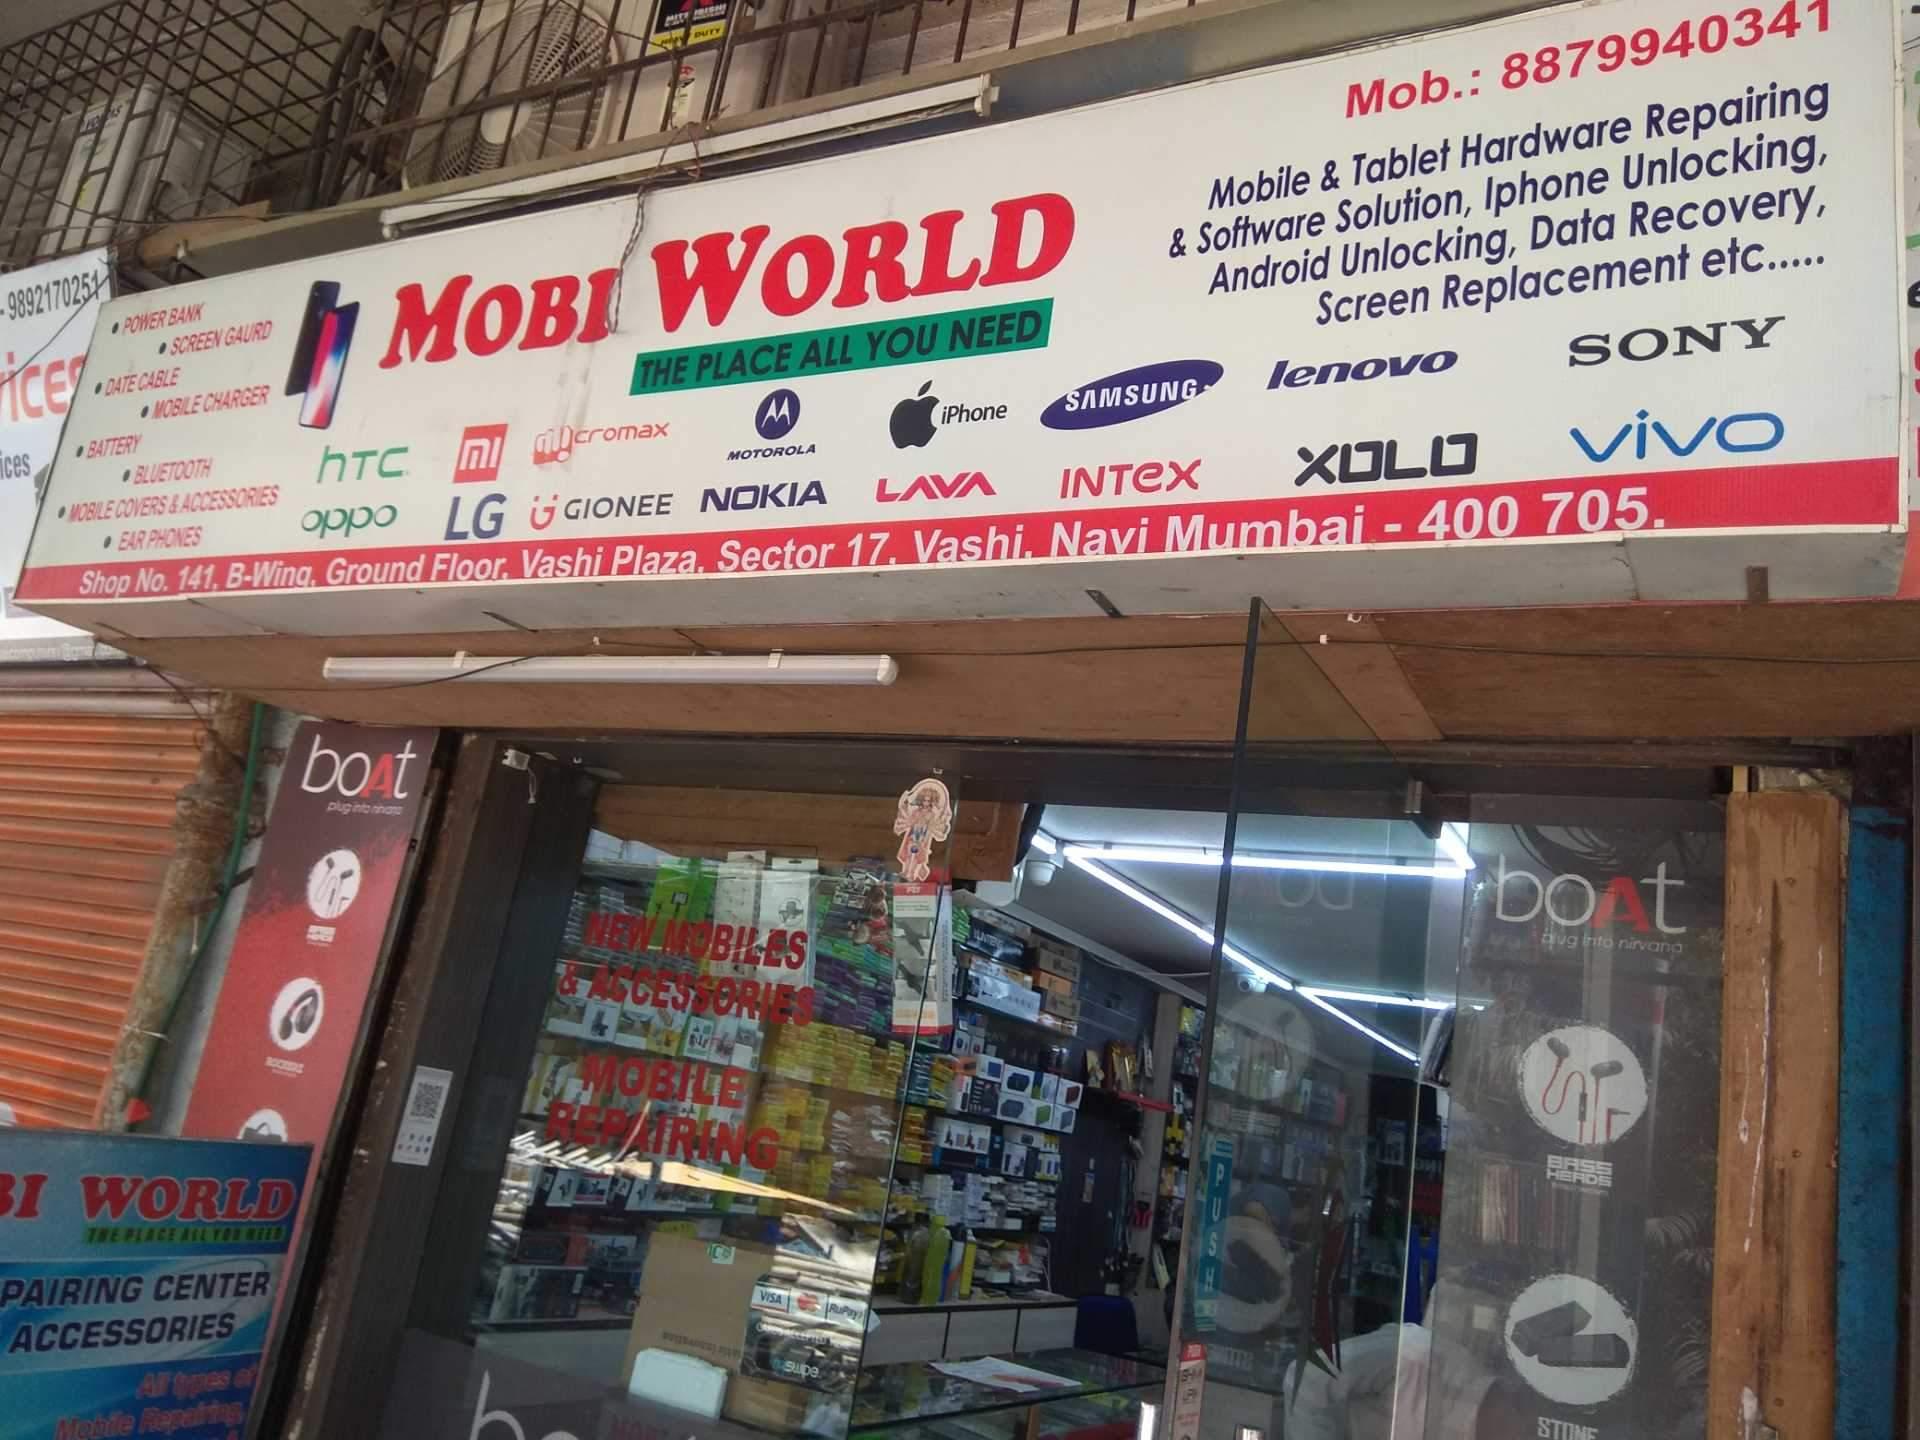 Top Infinix Mobile Phone Repair & Services in Vashi - Best Infinix